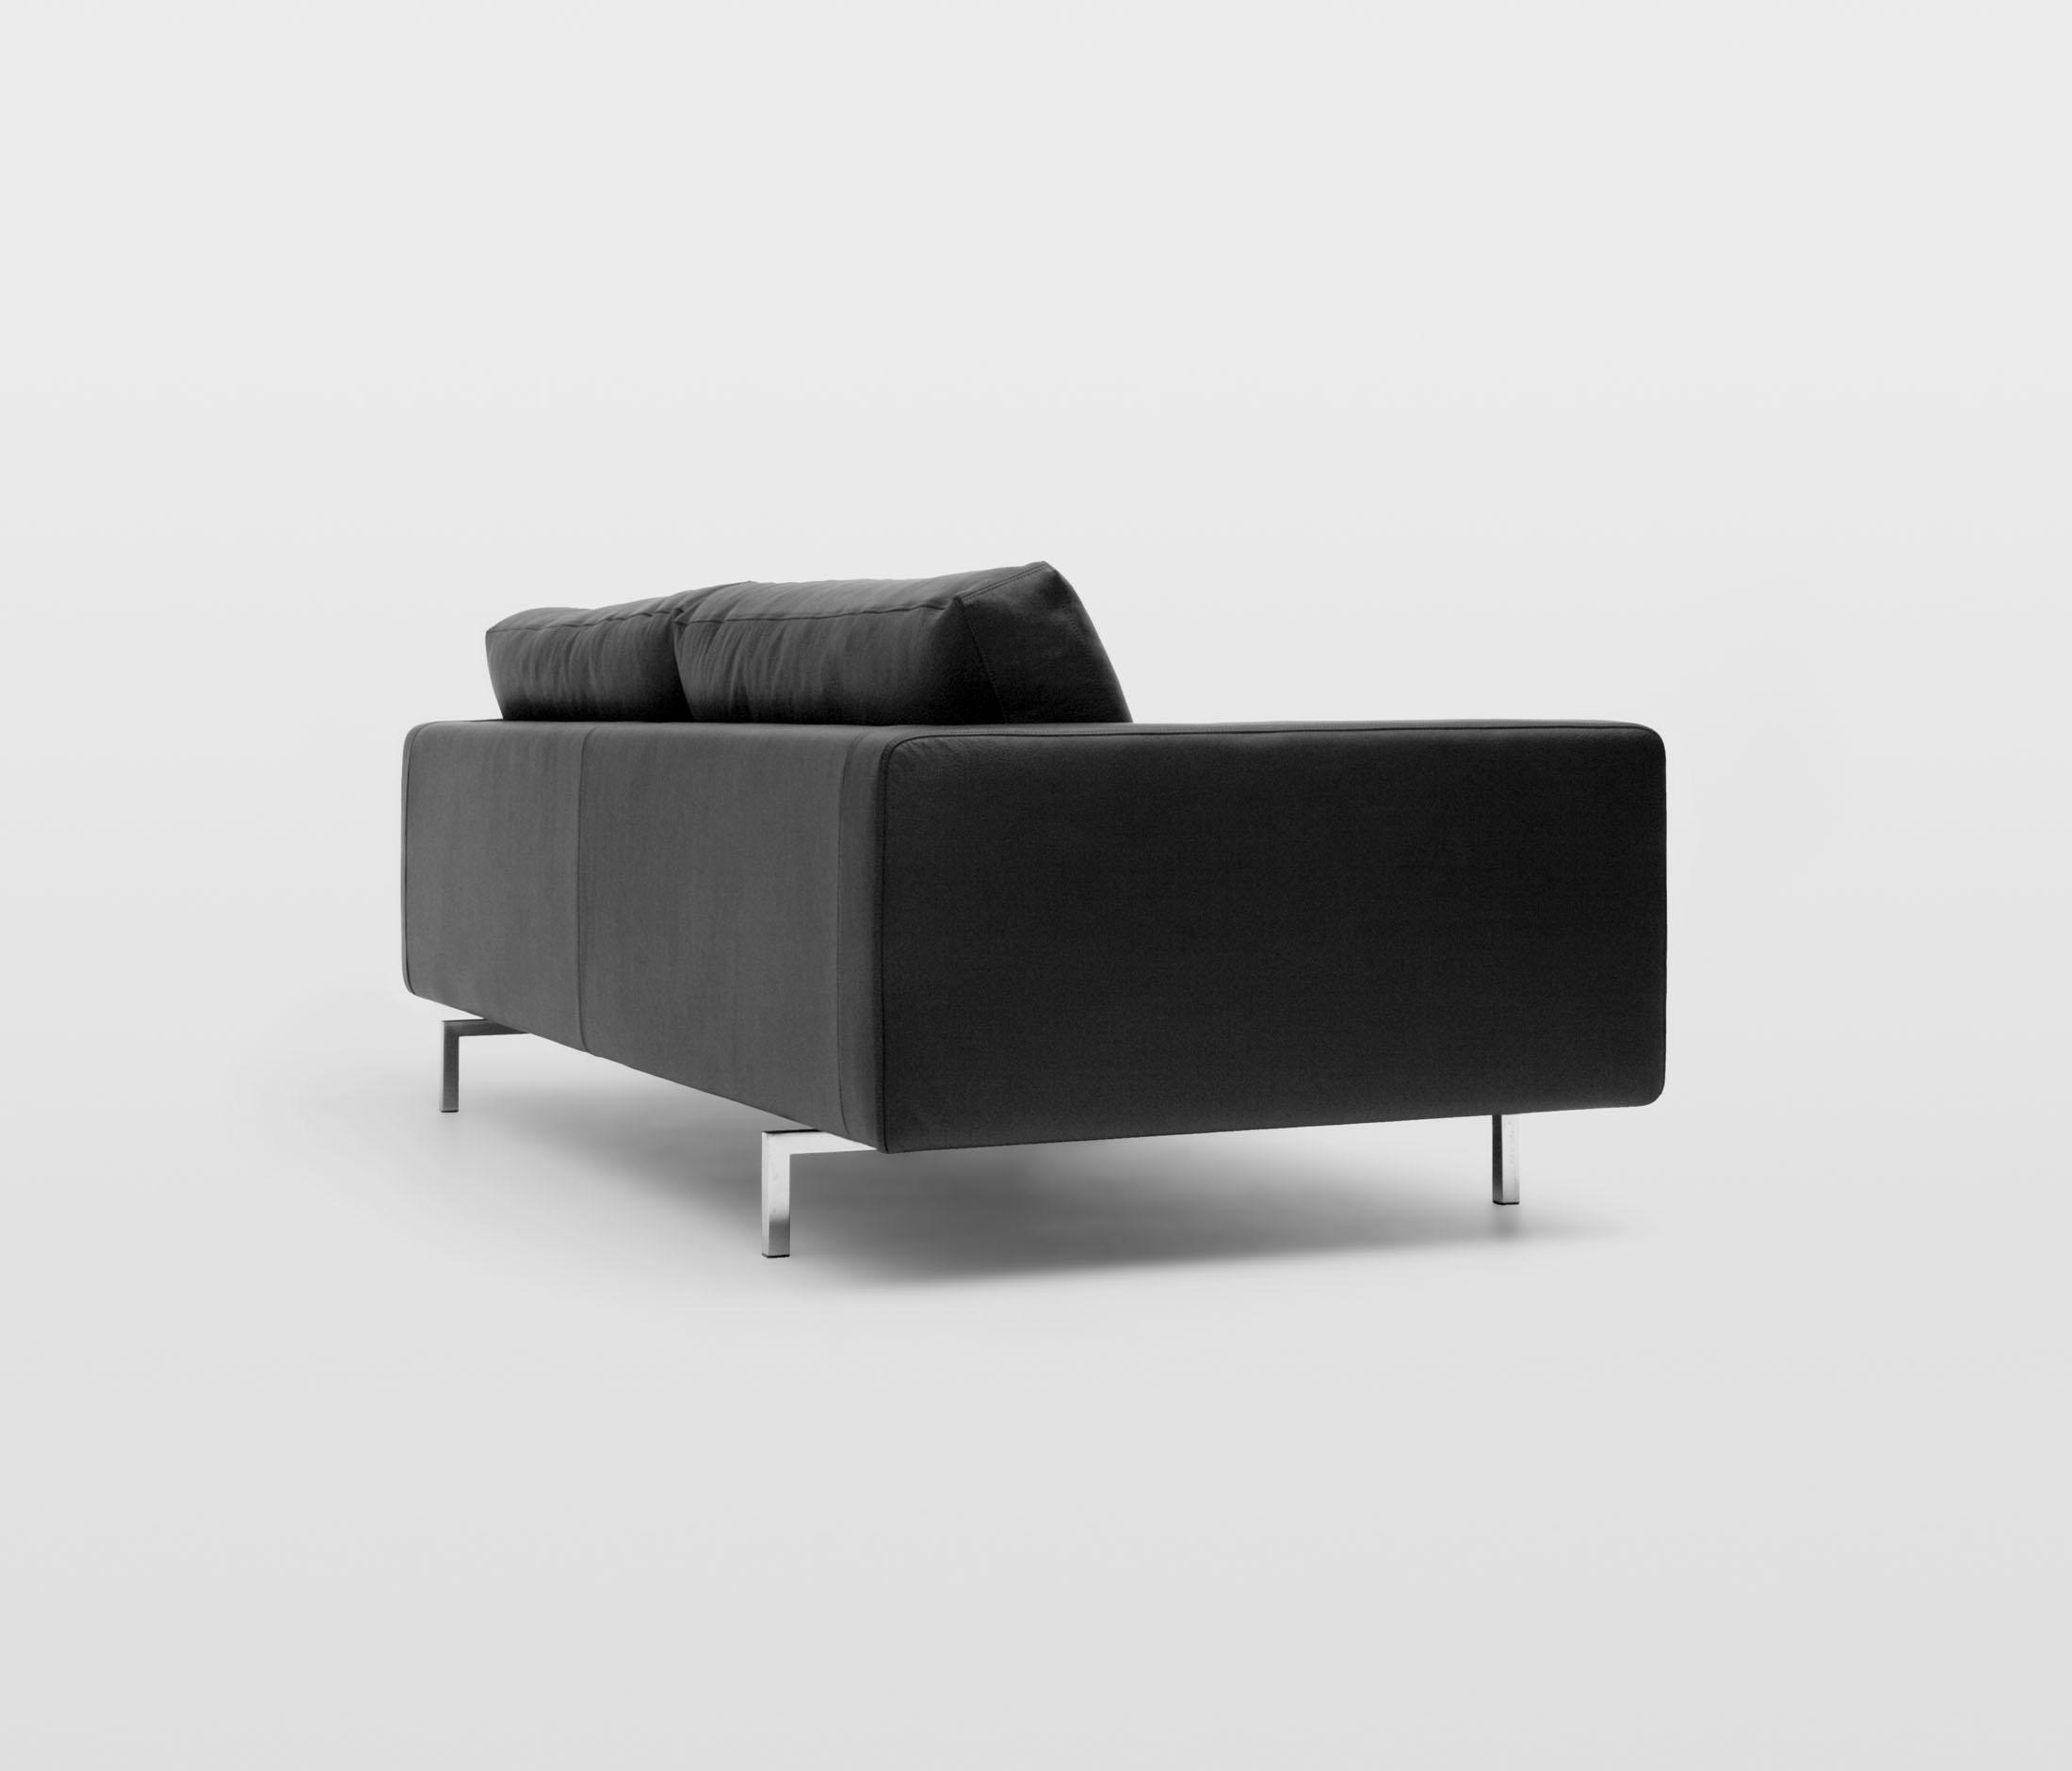 bensen lite sofa leather sleeping 2 seater lounge sofas from architonic